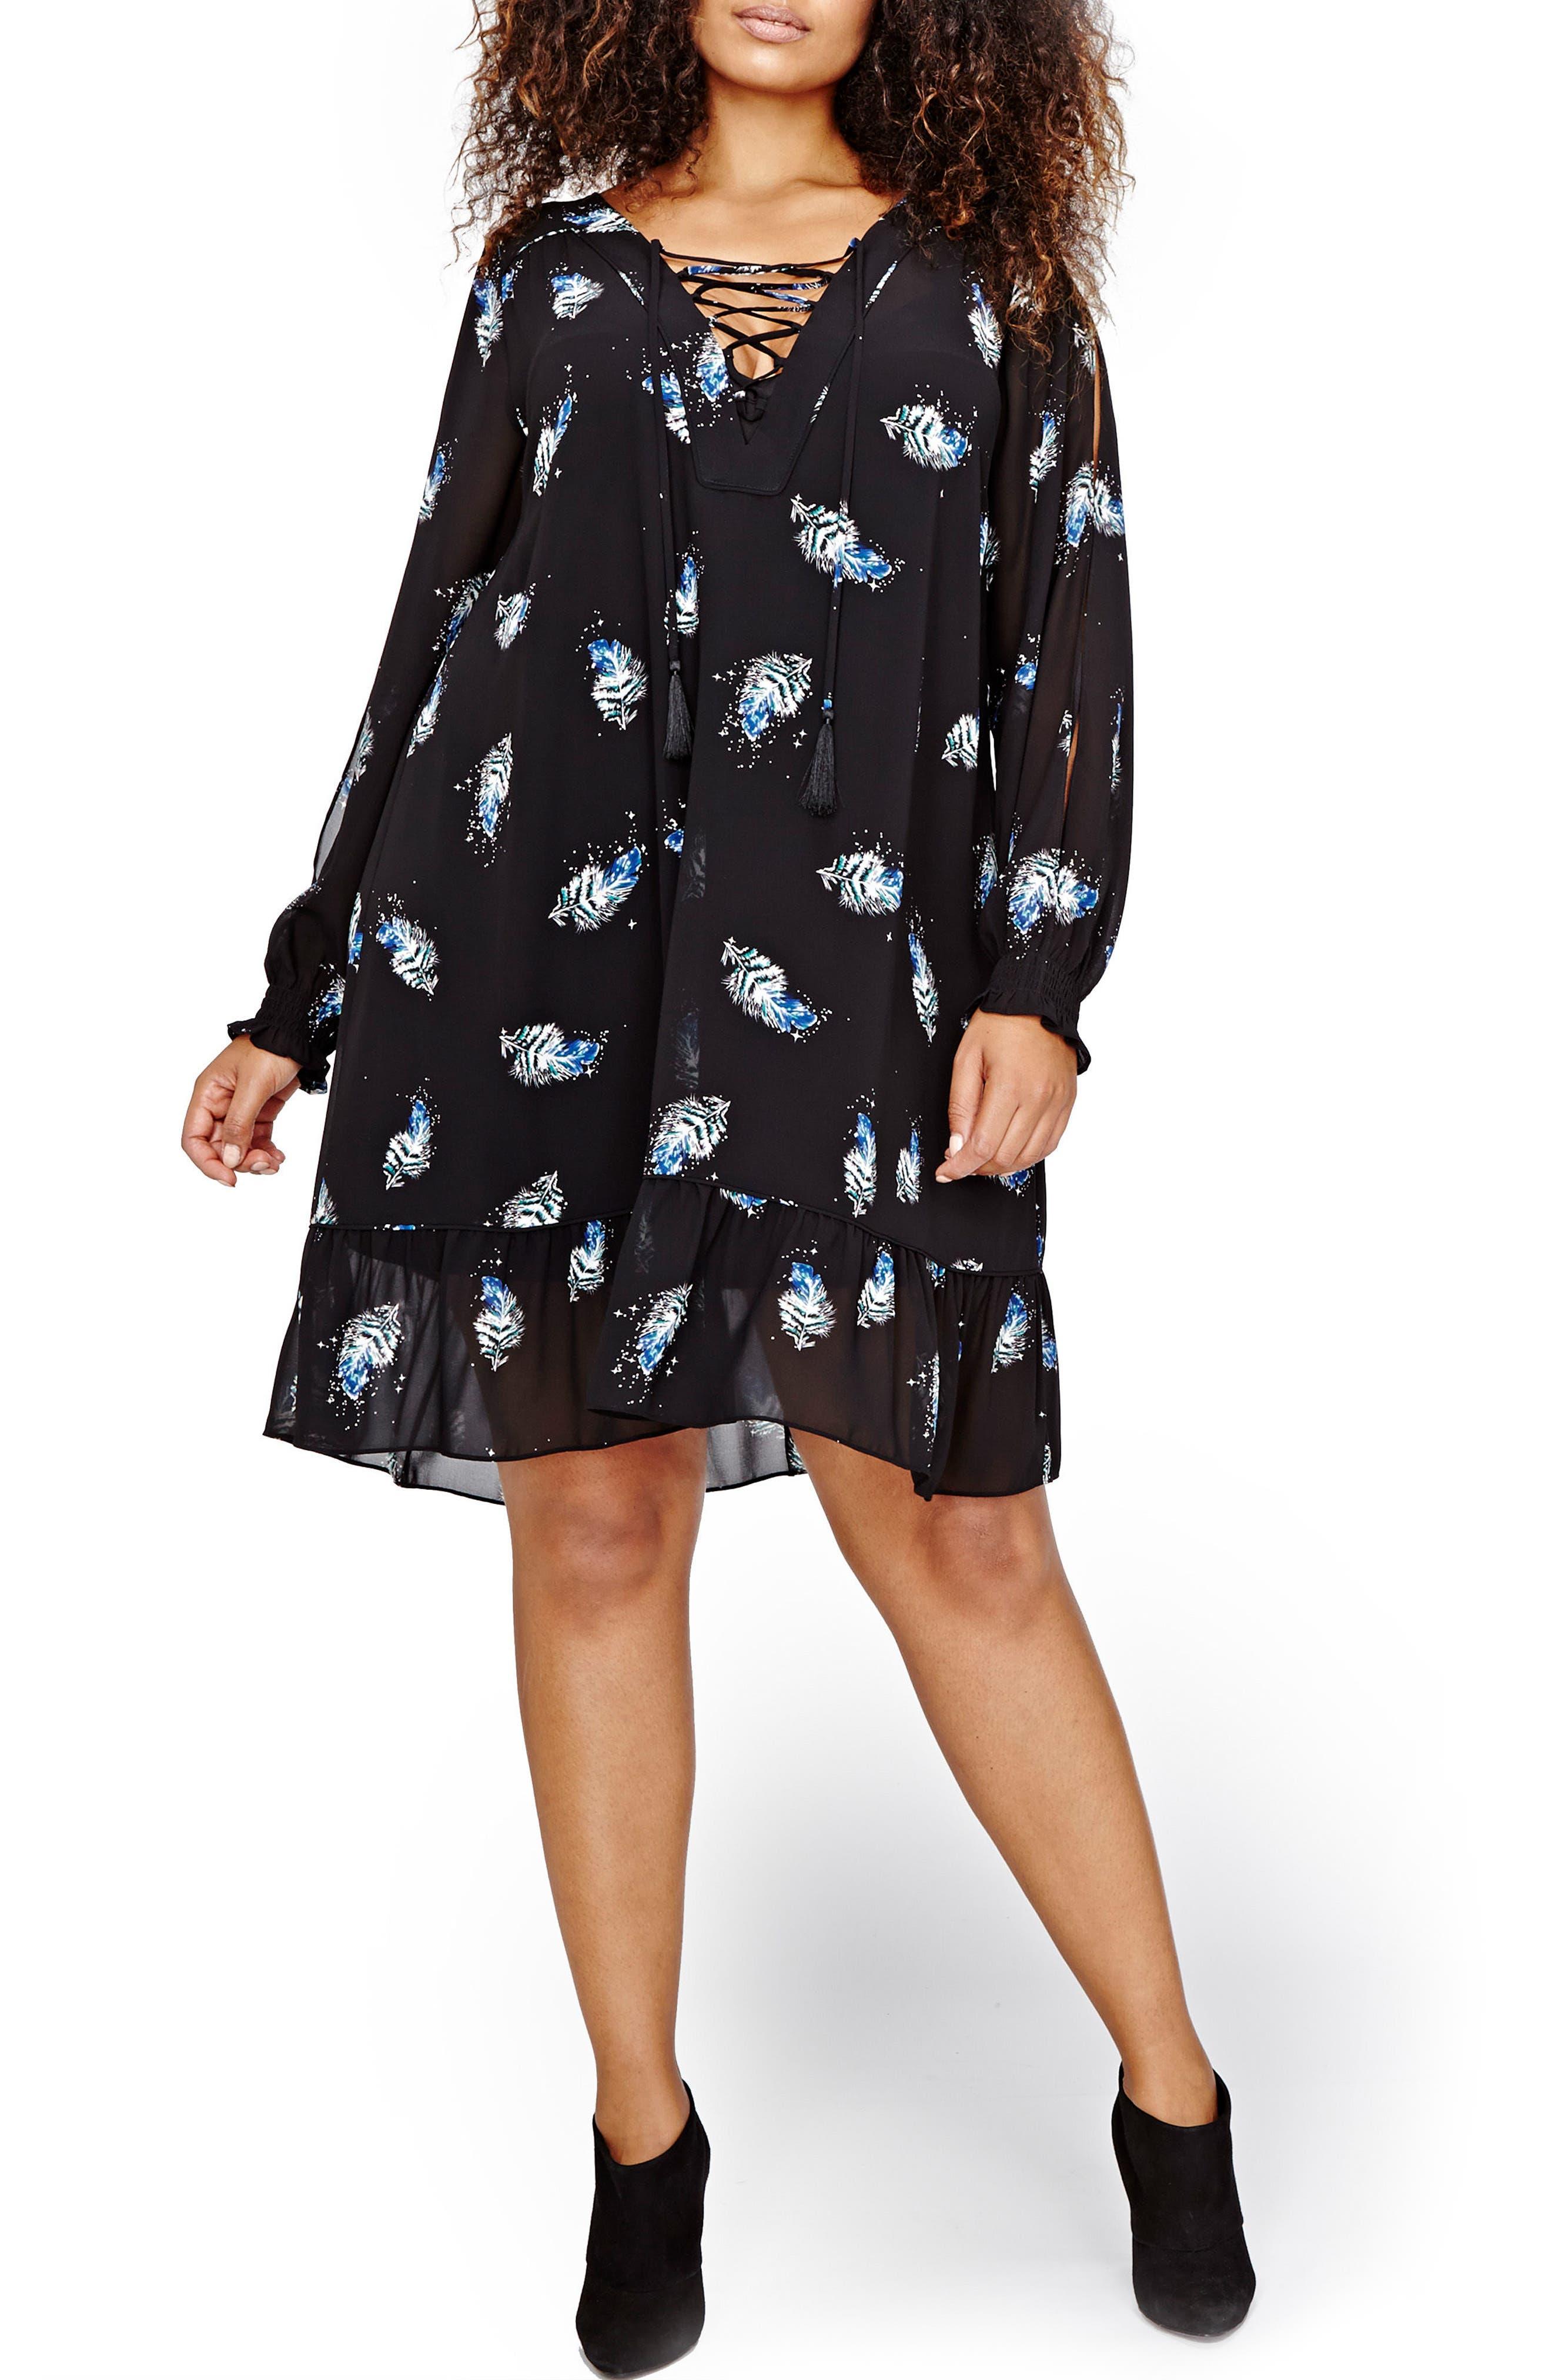 Main Image - ADDITION ELLE LOVE AND LEGEND Lace-Up Print Dress (Plus Size)